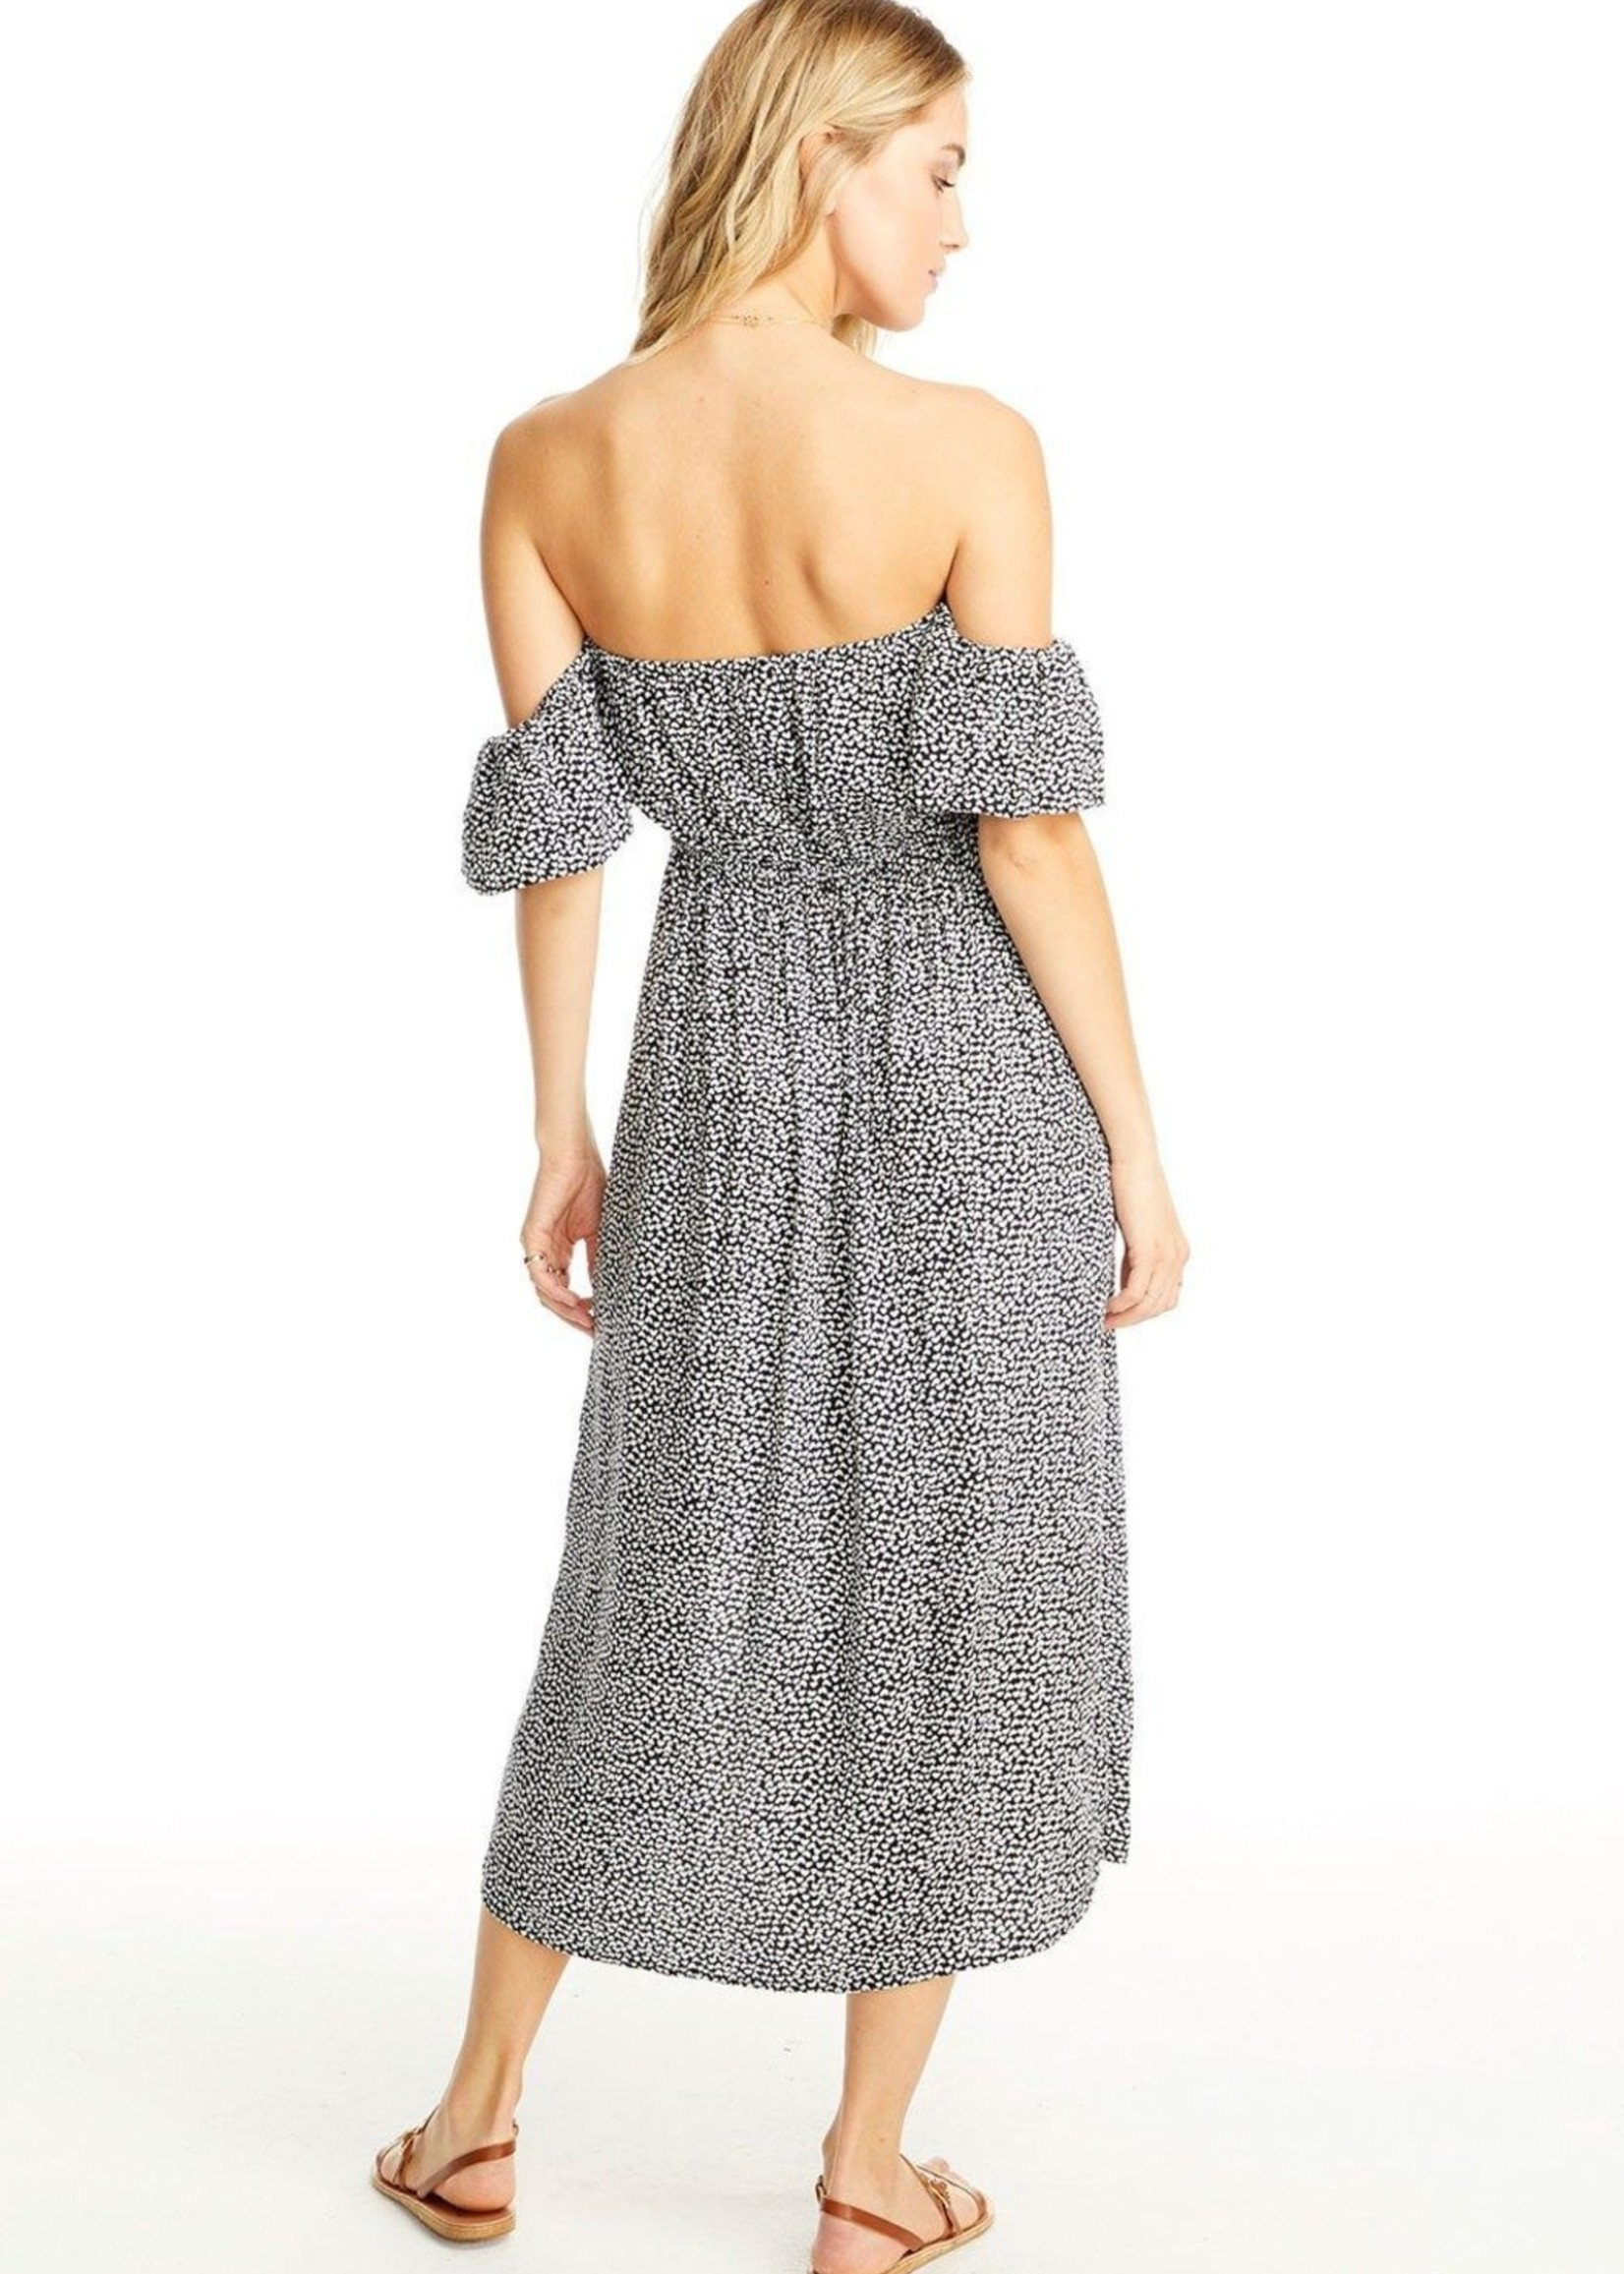 SALTWATER LUXE MILLER midi dress